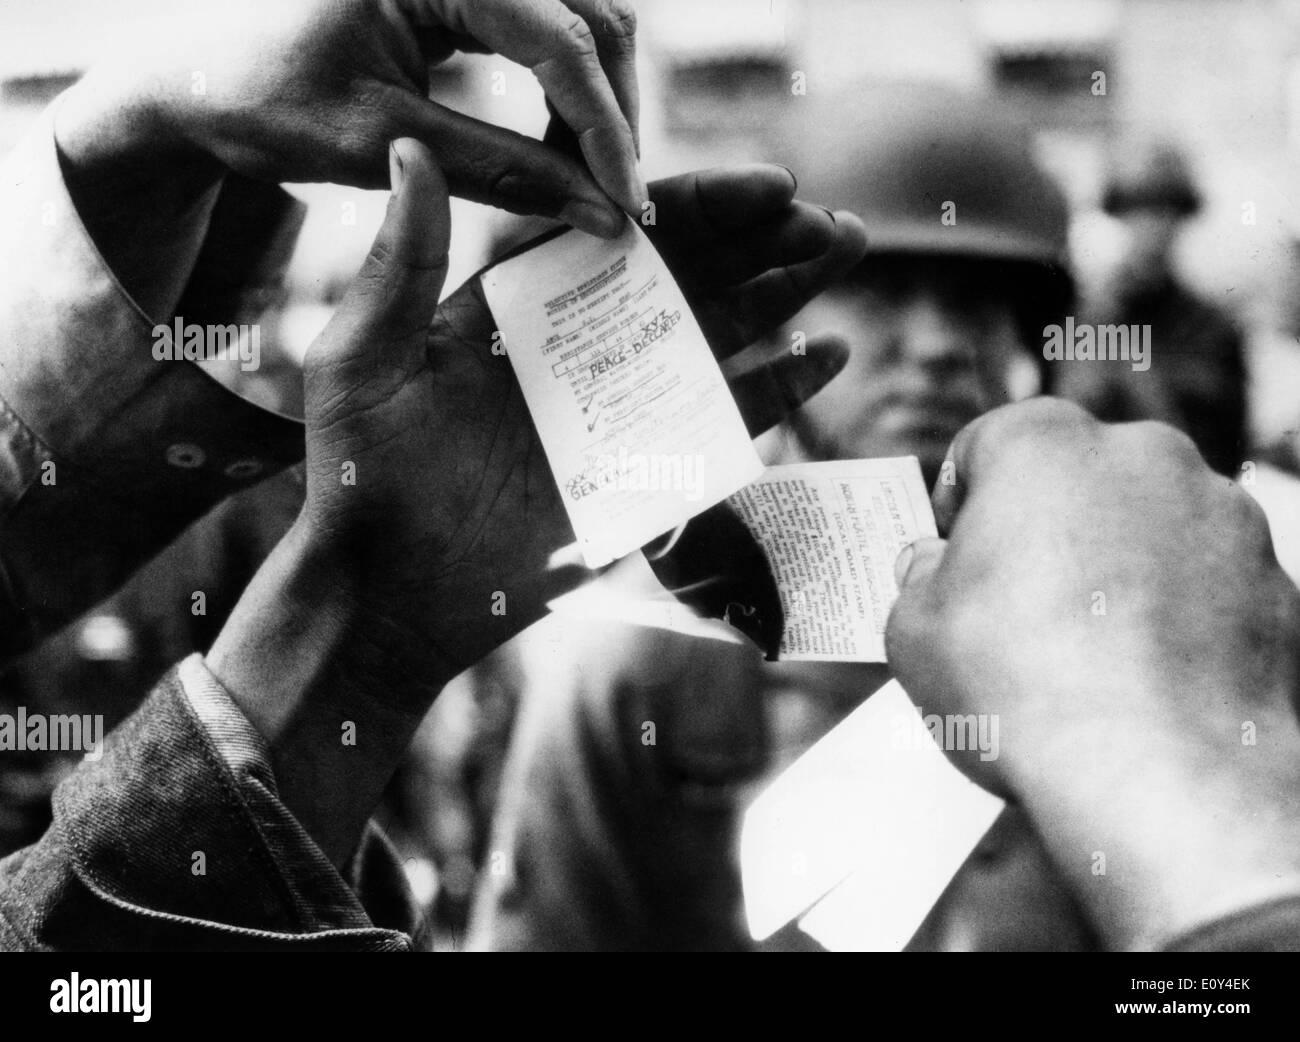 VIETNAM WAR: Protests - Stock Image